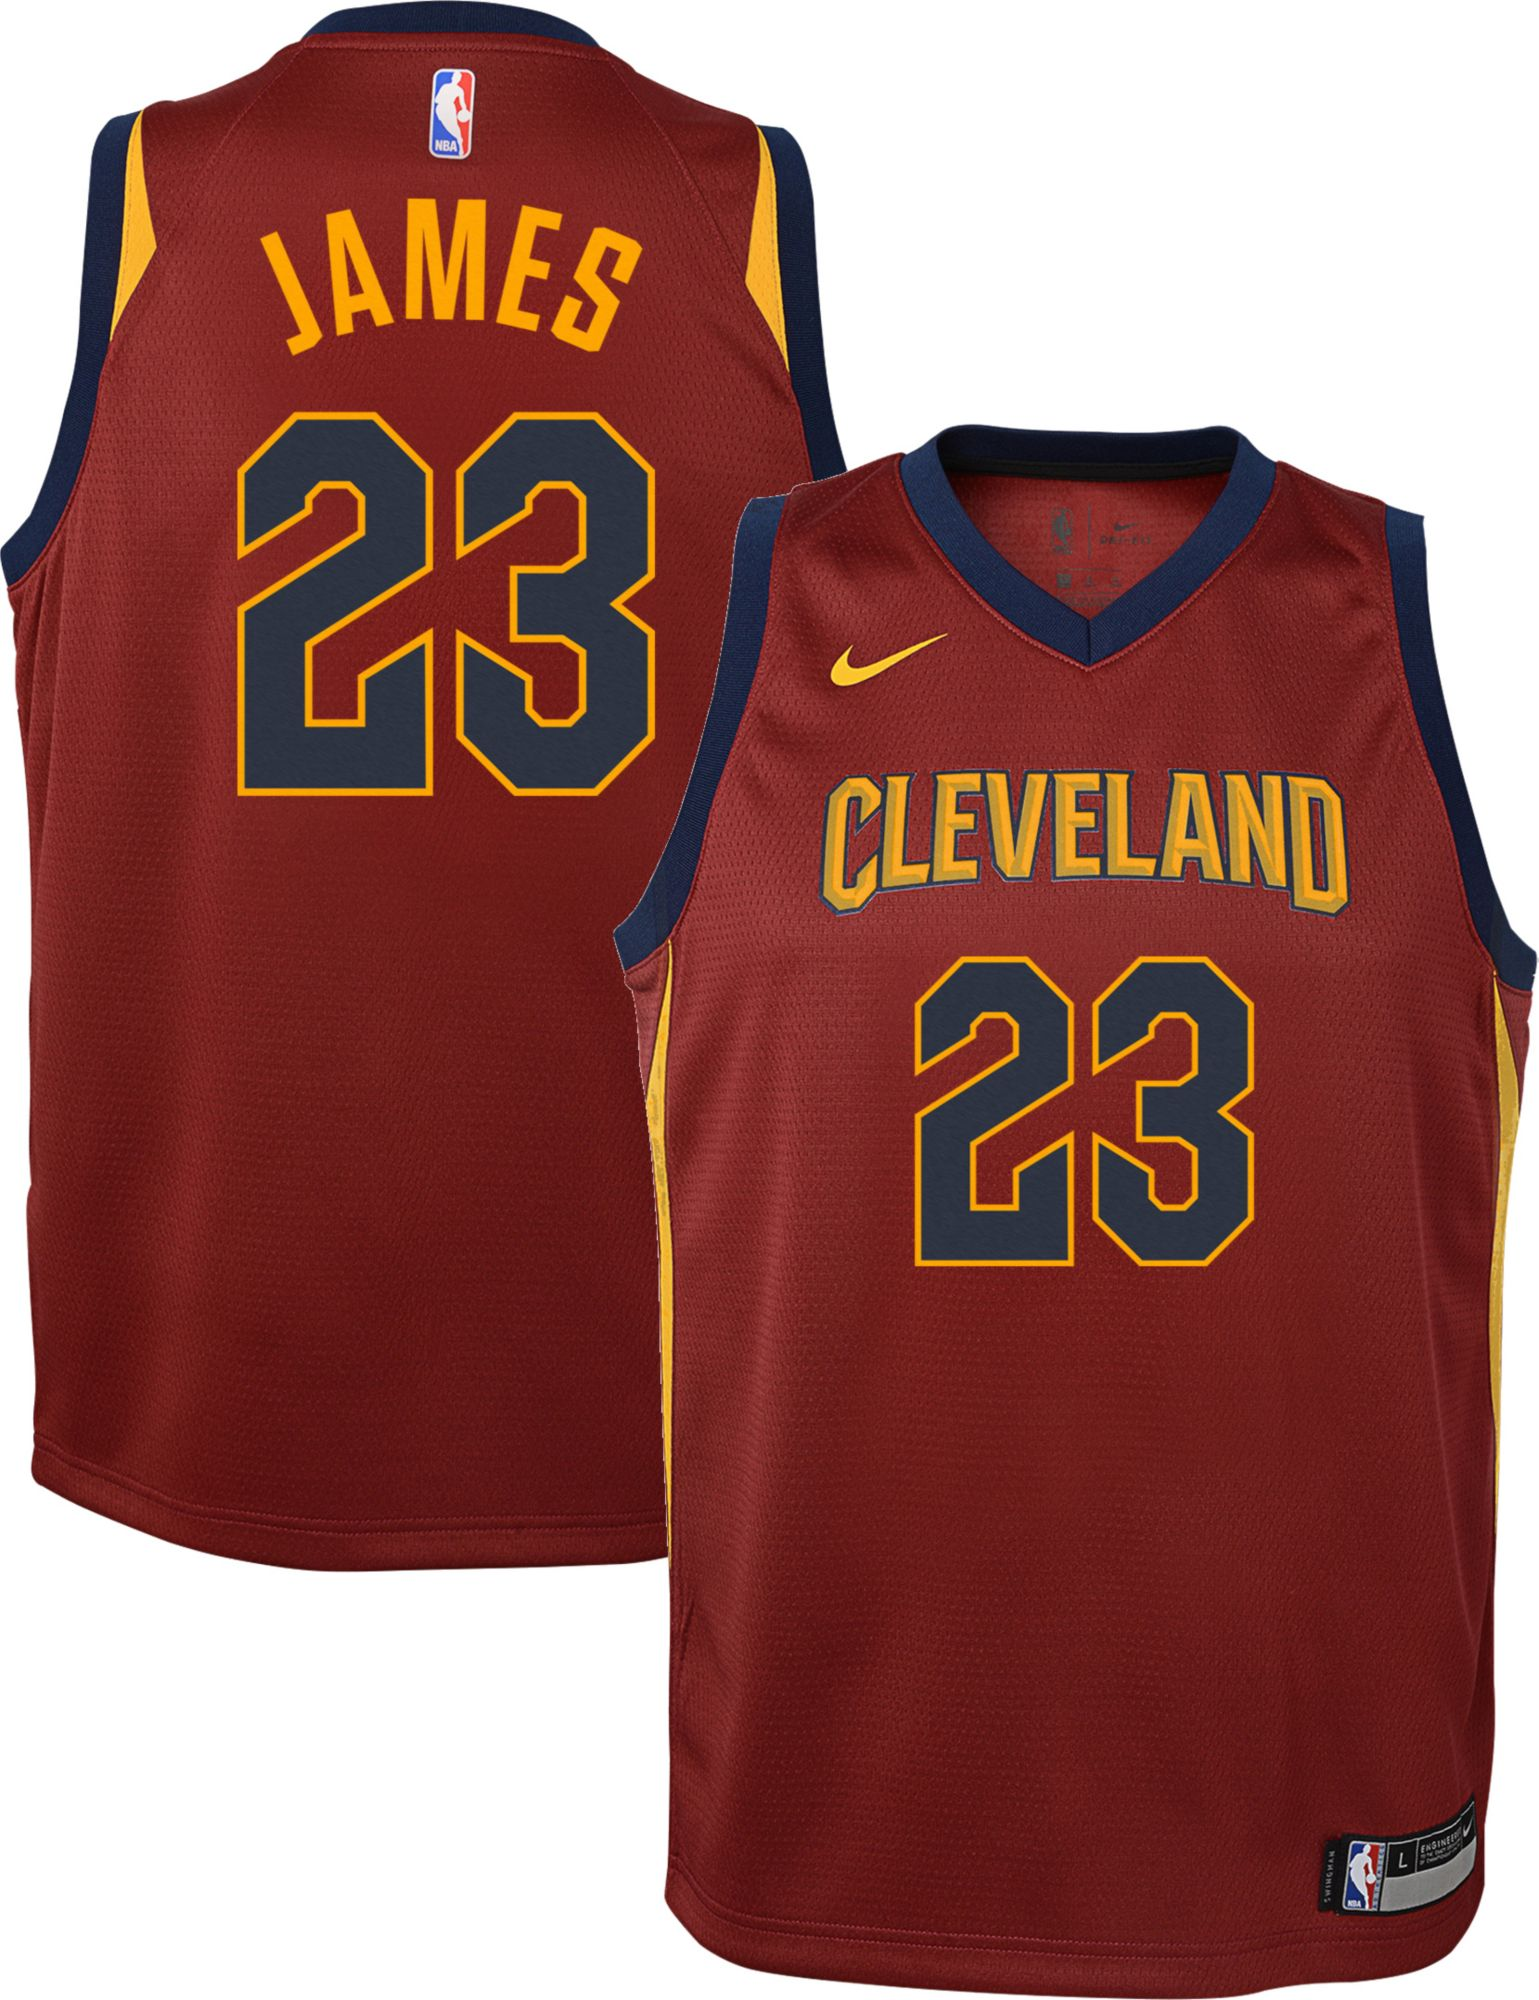 32dad1c54147 Nike Youth Cleveland Cavaliers LeBron James  23 Burgundy Dri-FIT ...